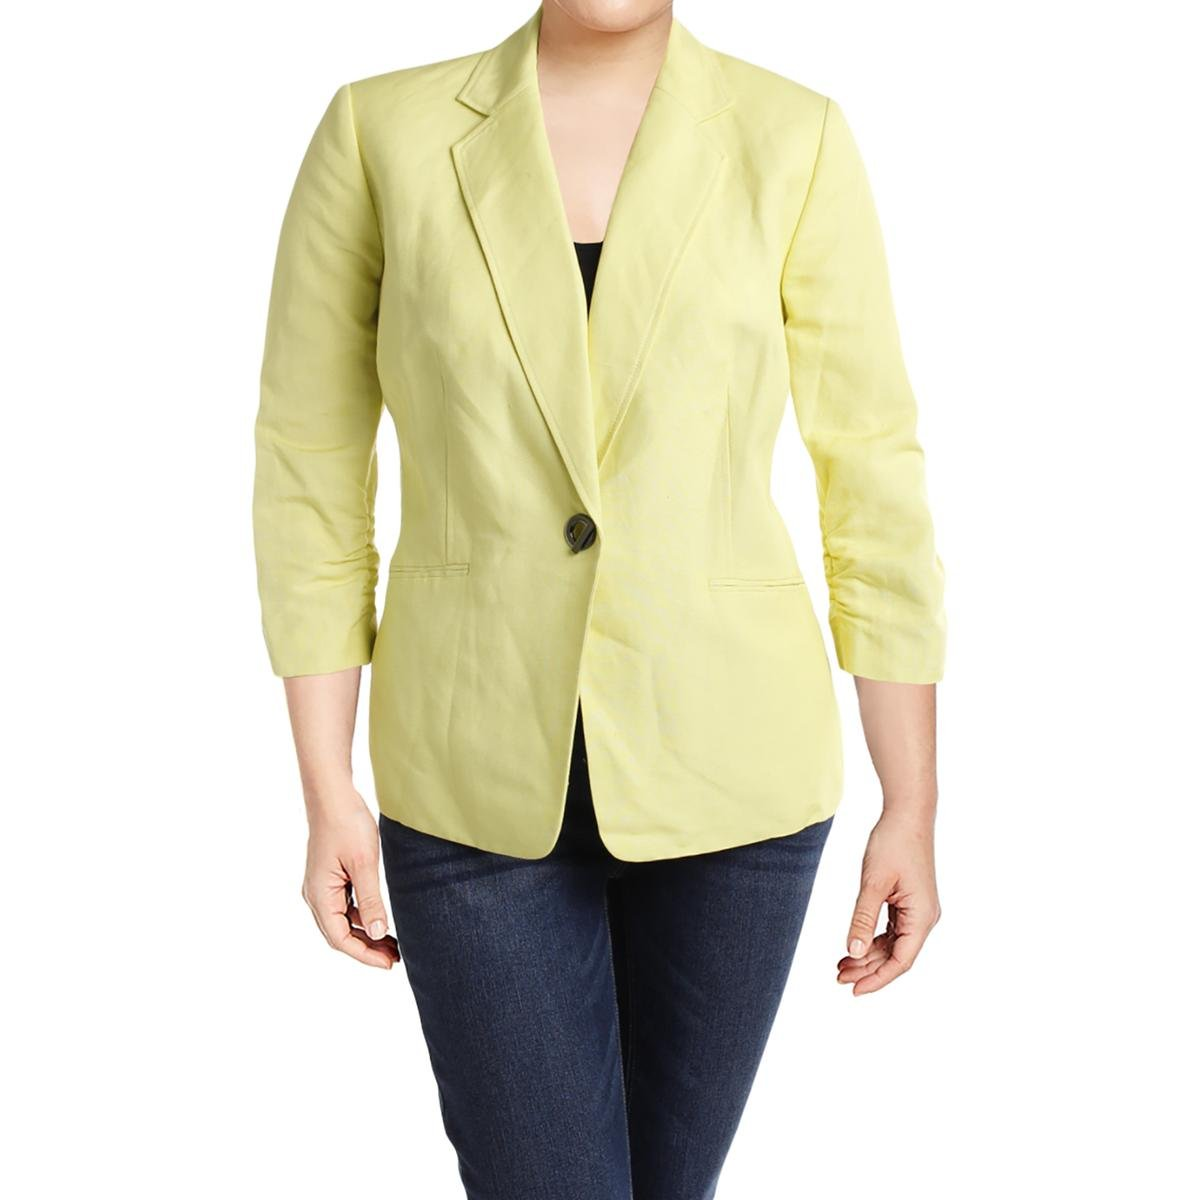 Kasper Womens Plus Linen Blend 3/4 Sleeves One-Button Blazer Yellow 18W